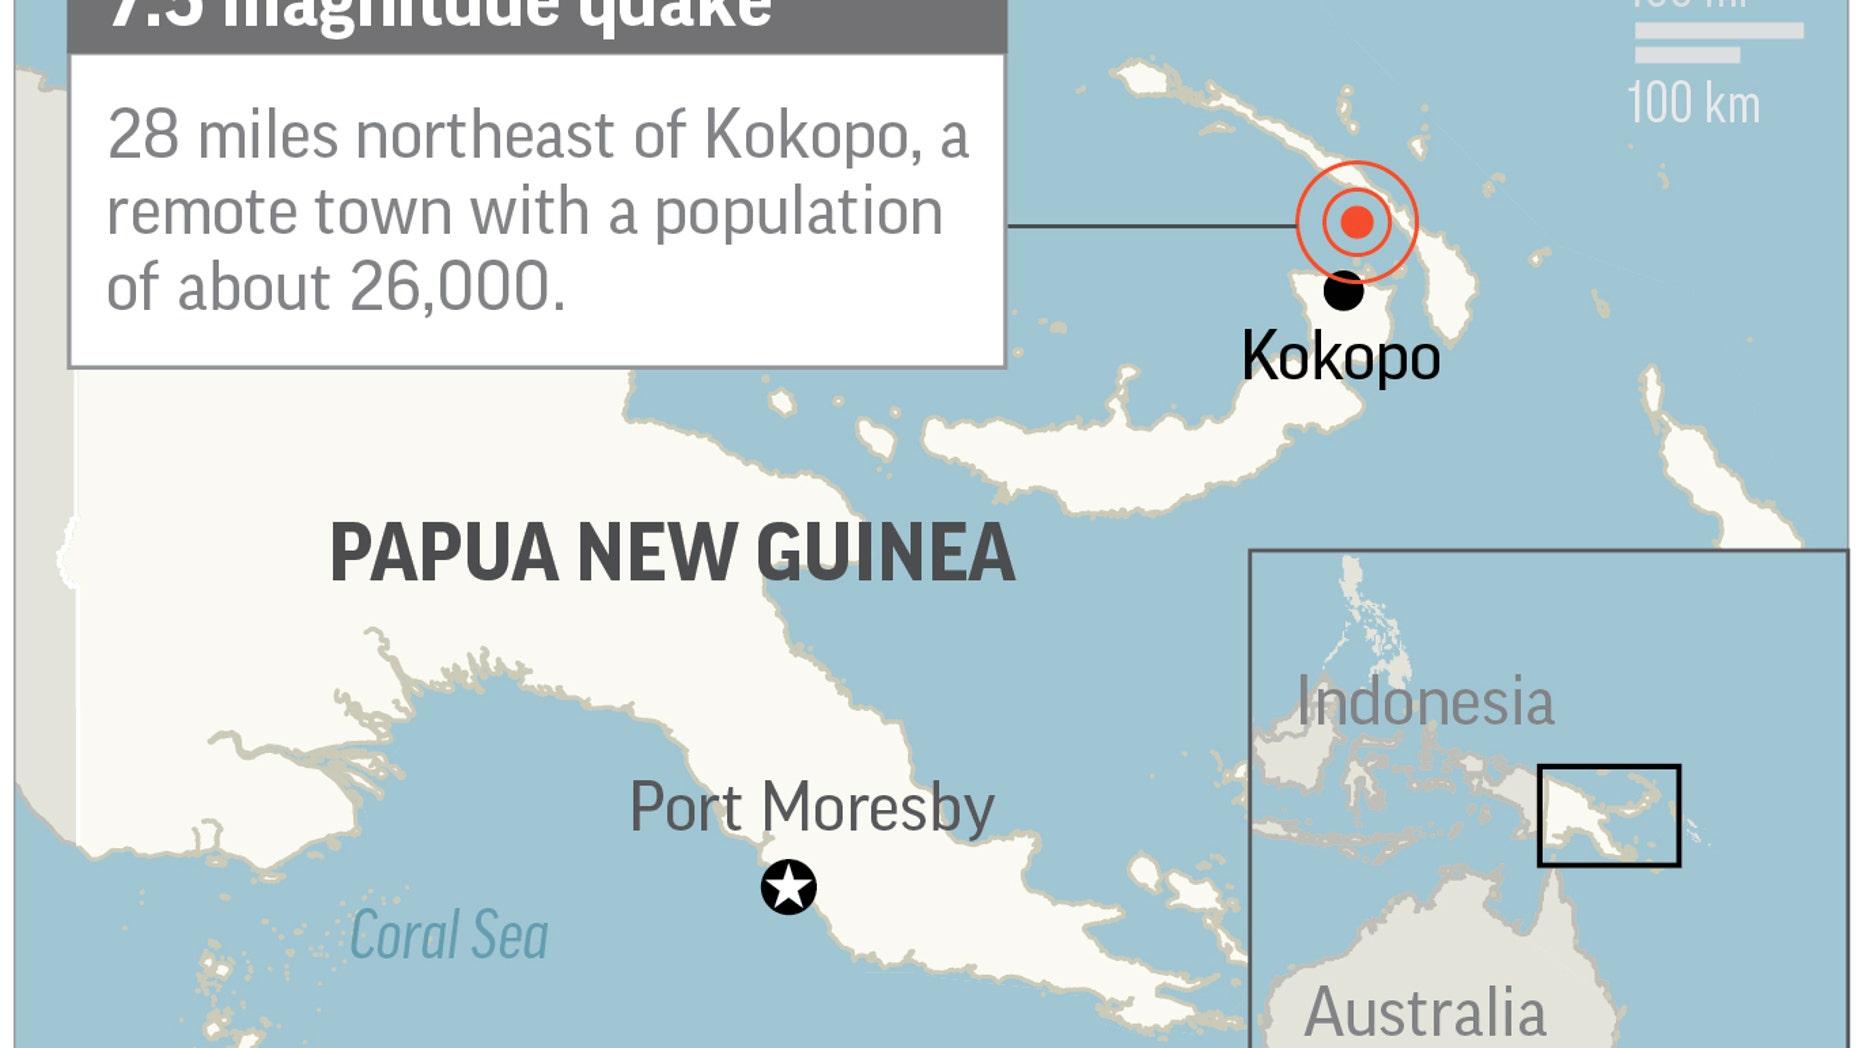 Map locates magnitude-7.5 quake in Papua New Guinea; 2c x 2 1/4 inches; 96.3 mm x 57 mm;